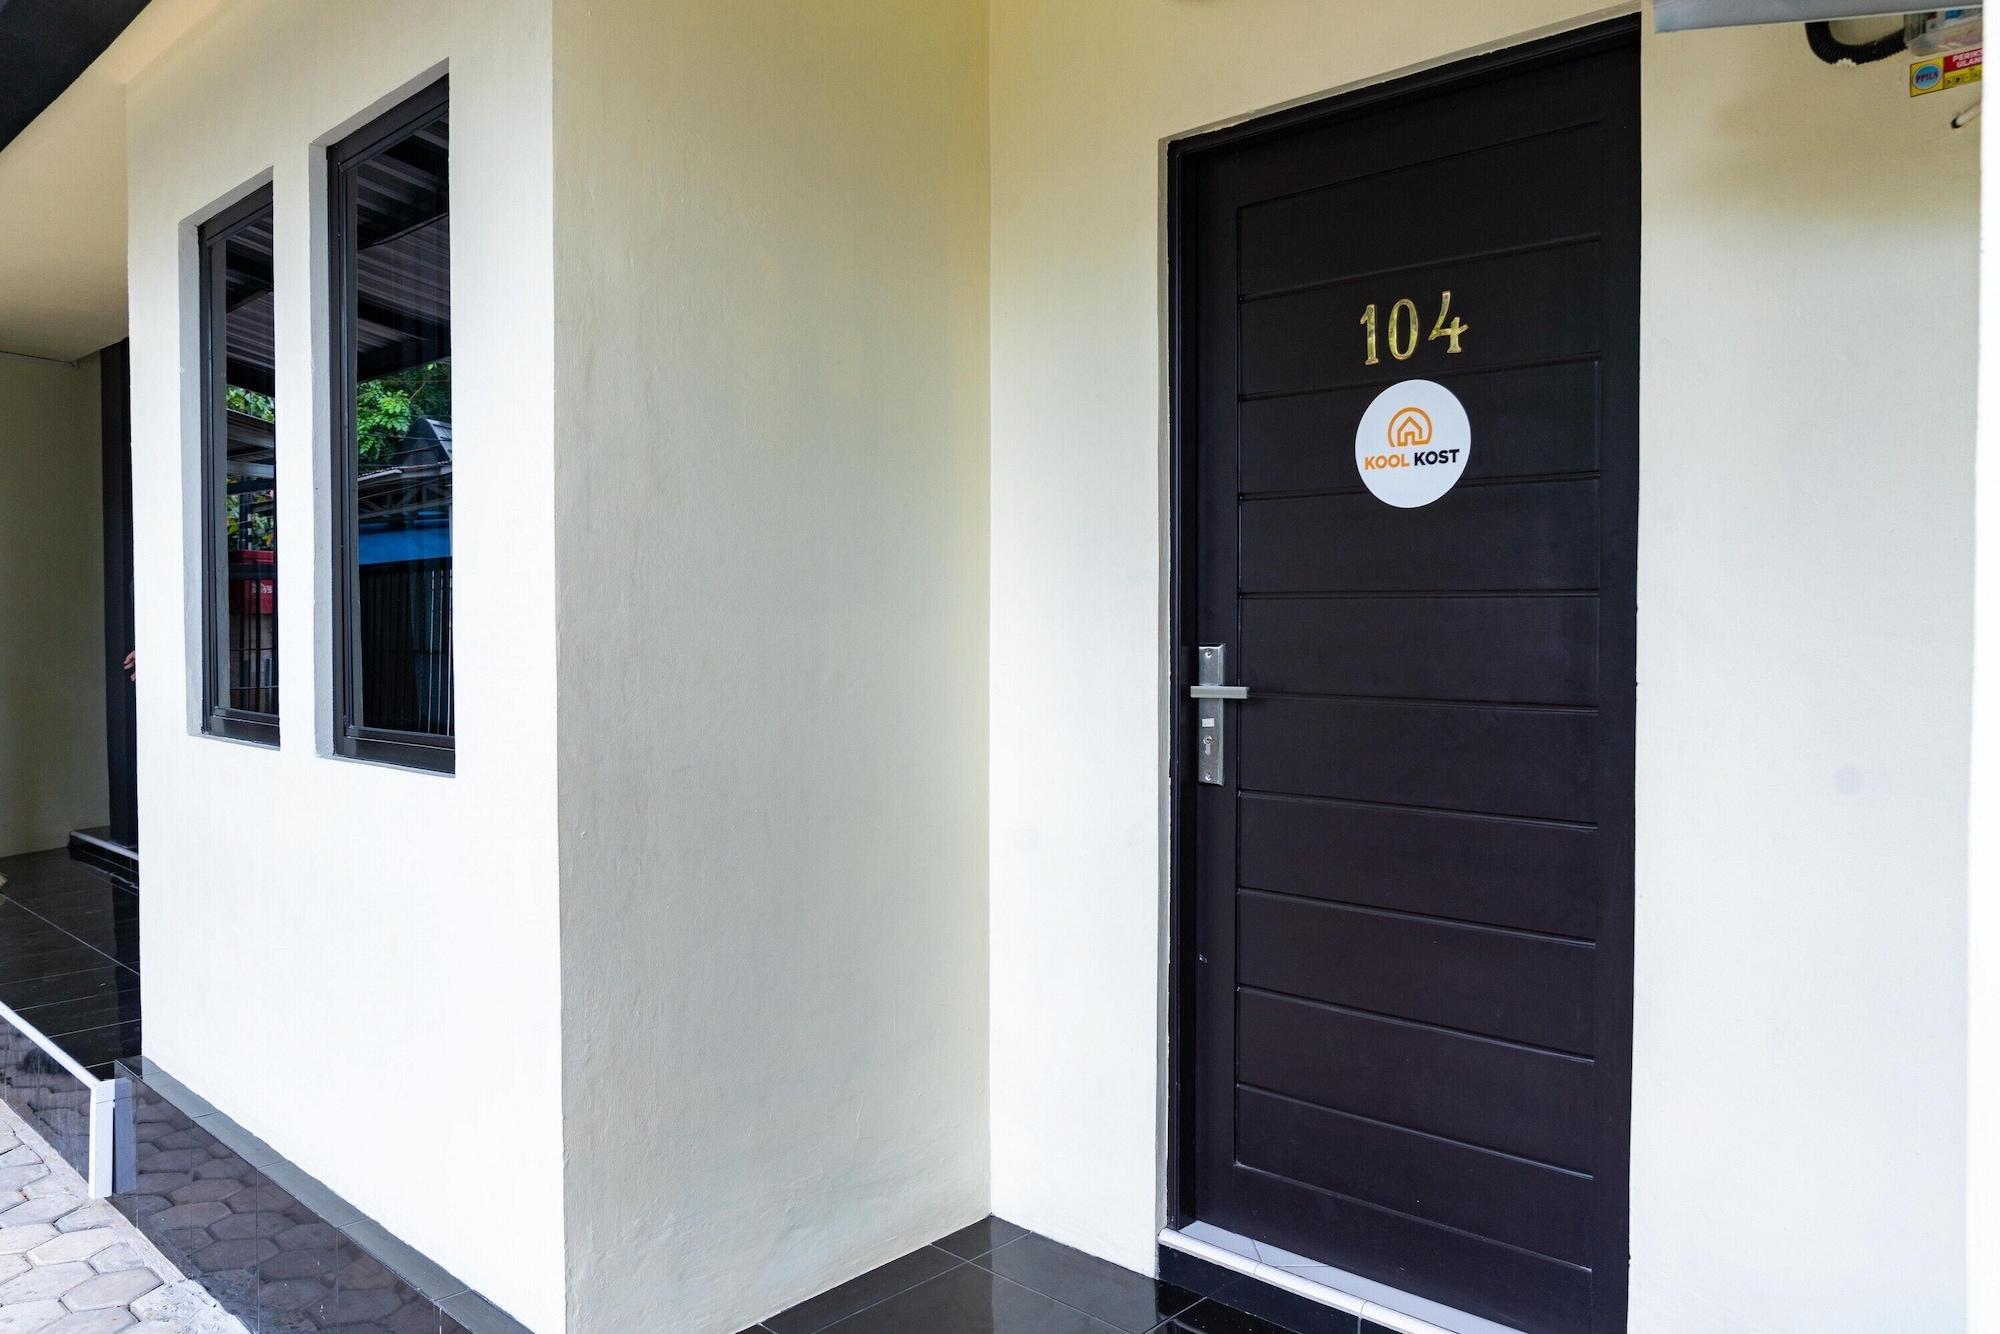 KoolKost Syariah near Universitas Lambung Mangkurat, Banjarmasin